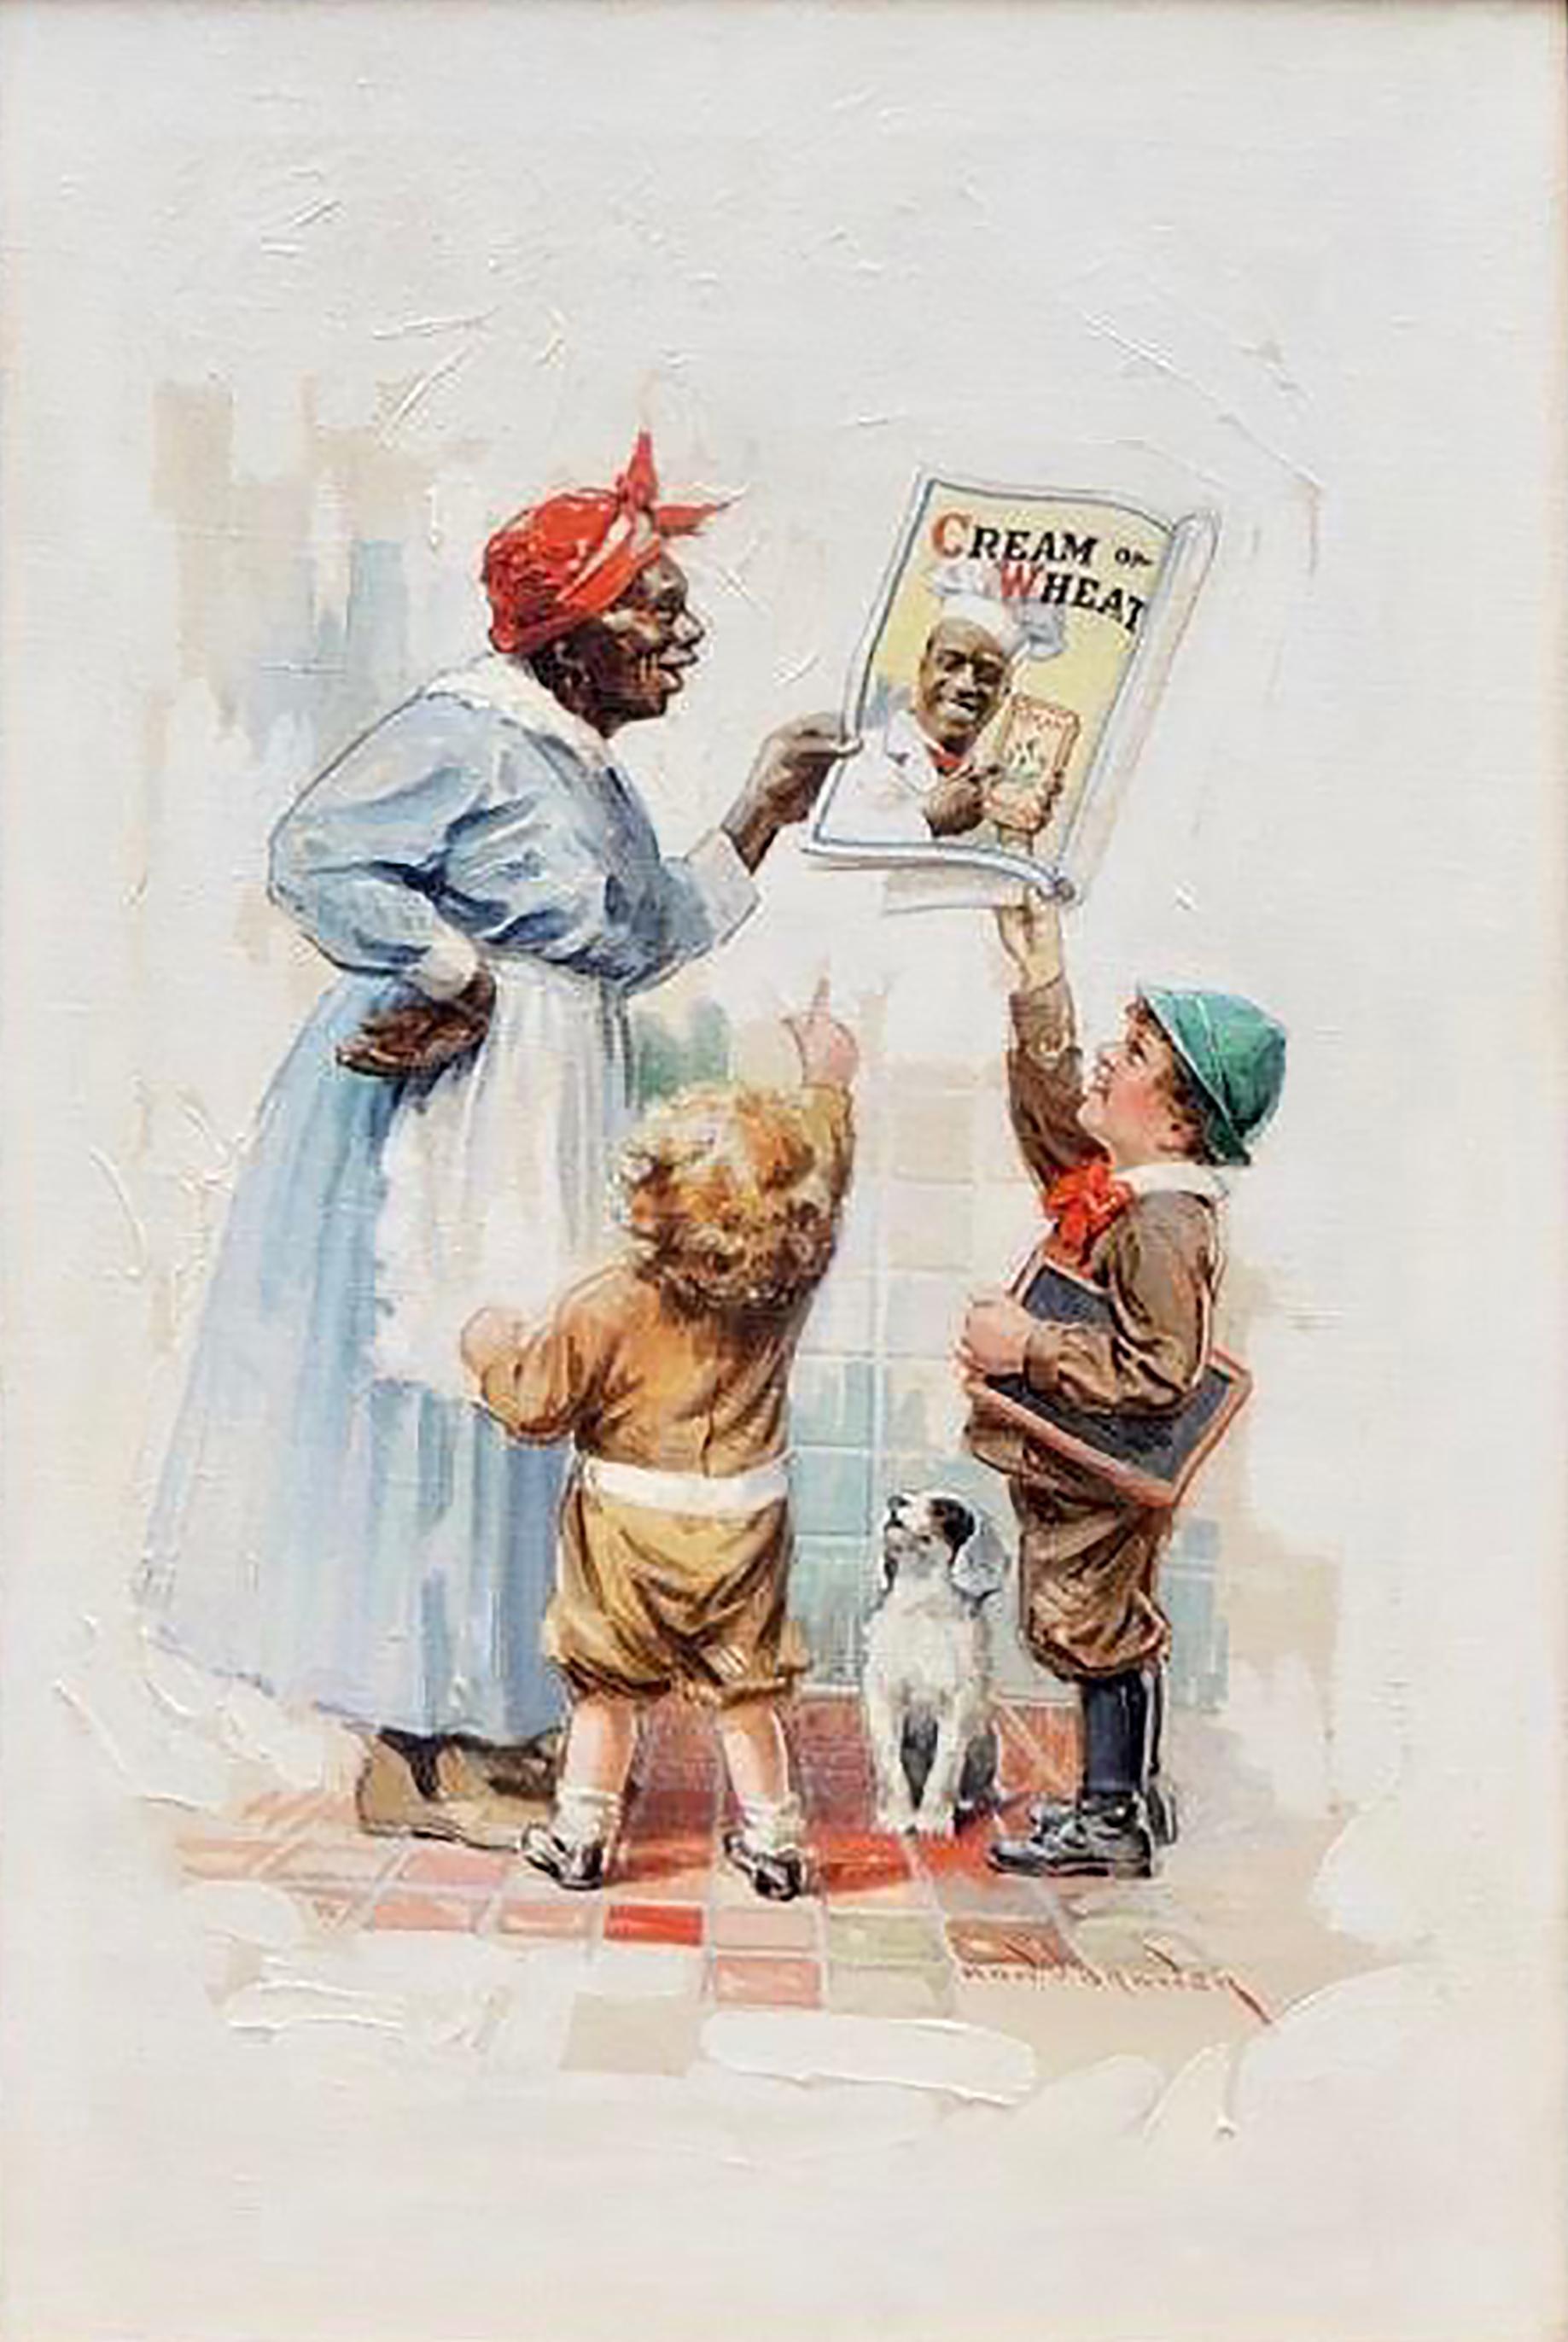 Cream of Wheat Advertisement, Saturday Evening Post, May 5, 1920